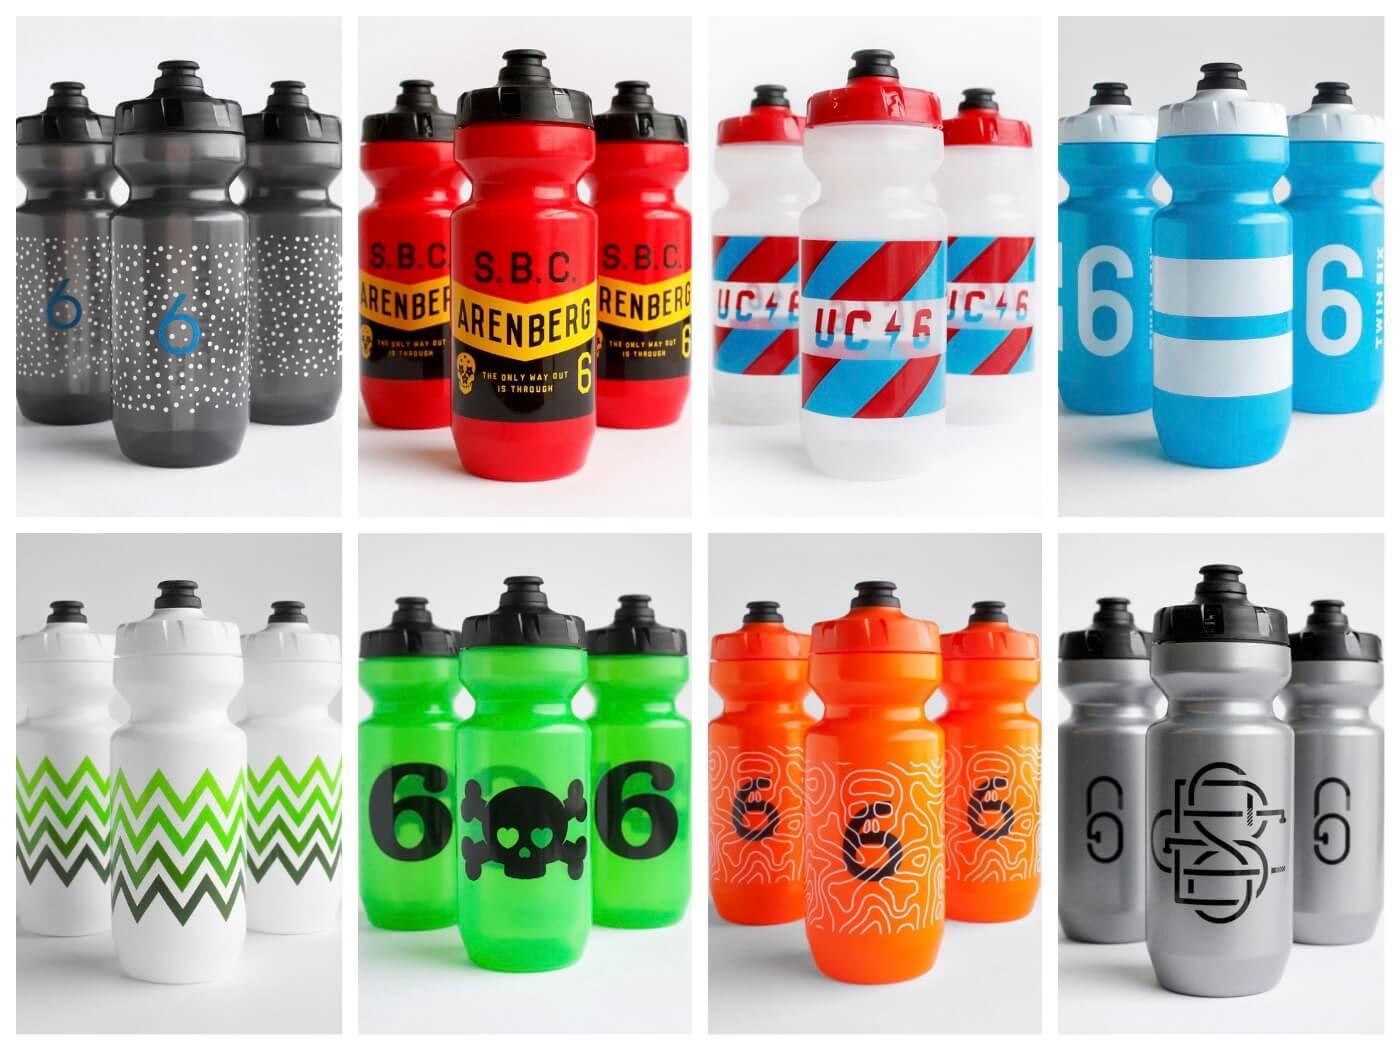 twinsix_bottles